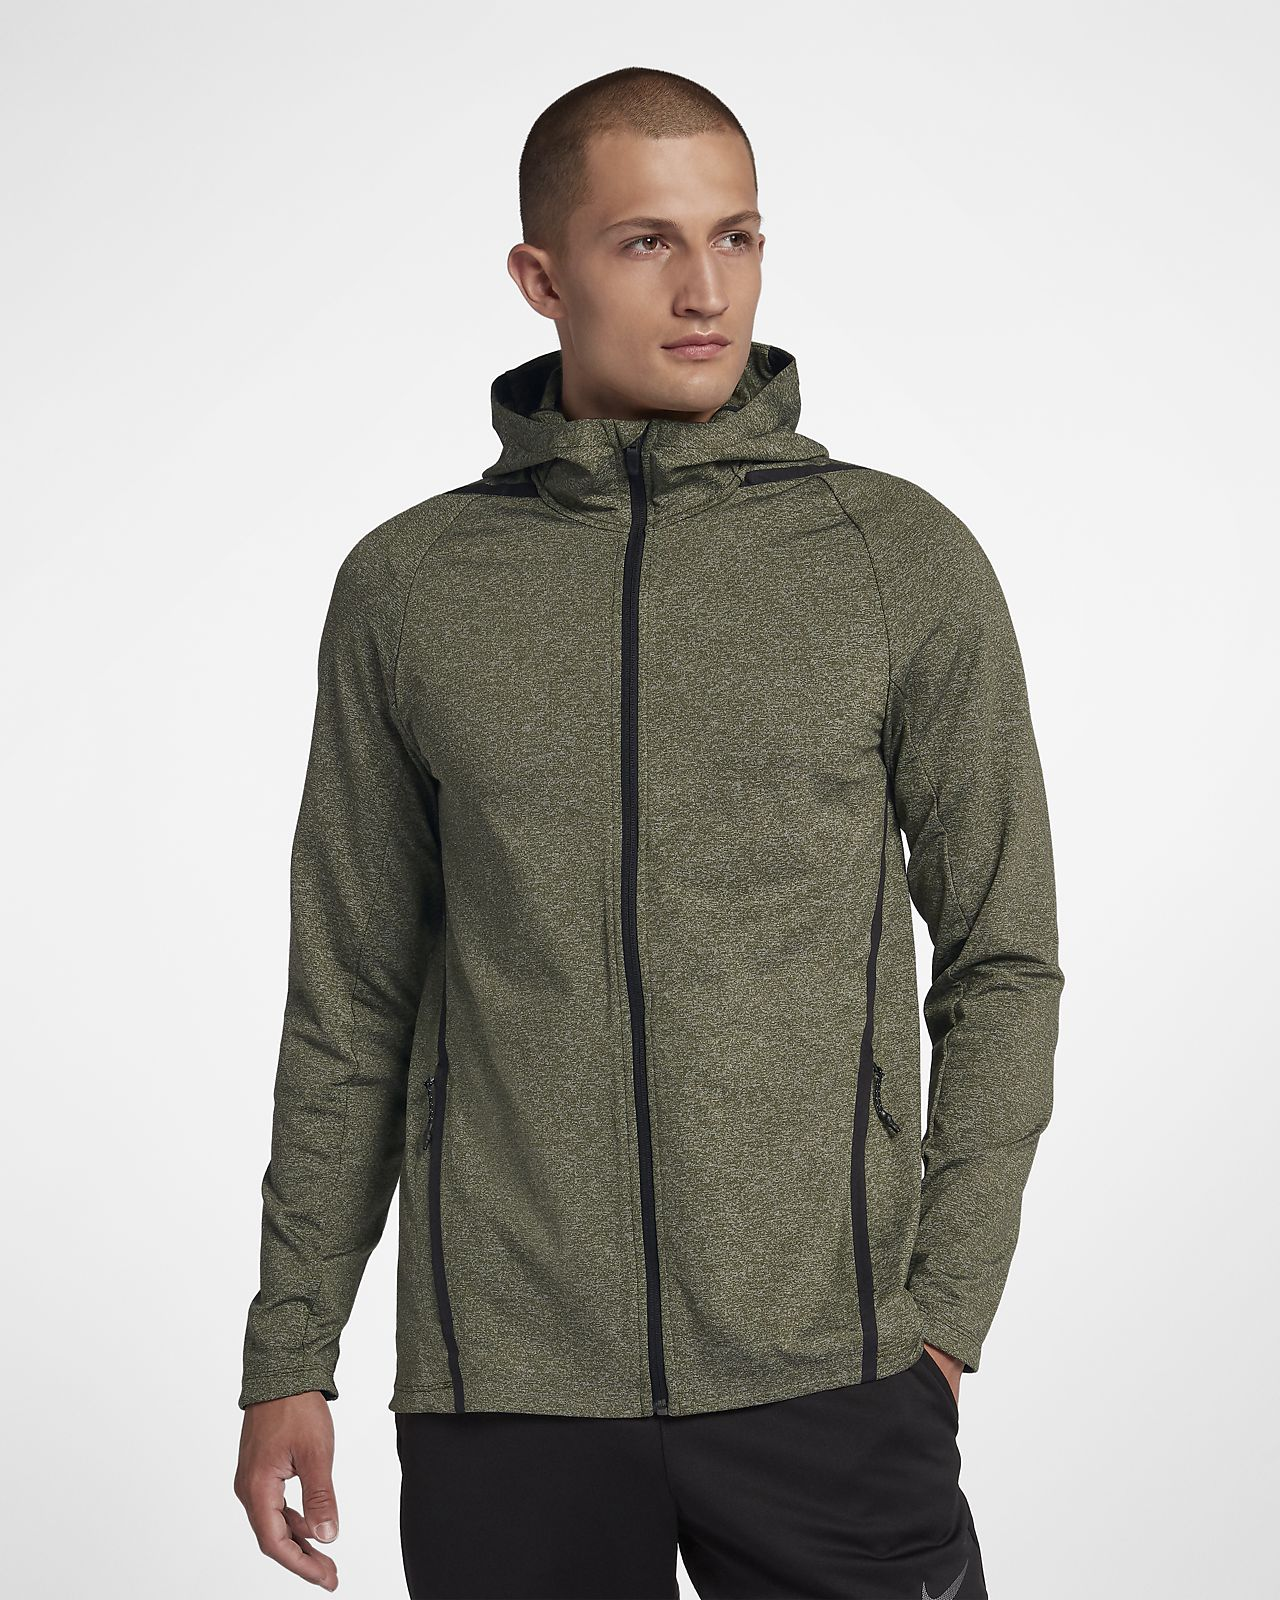 4801cff829a2 Nike Dri-FIT Men s Long-Sleeve Full-Zip Training Hoodie. Nike.com NO